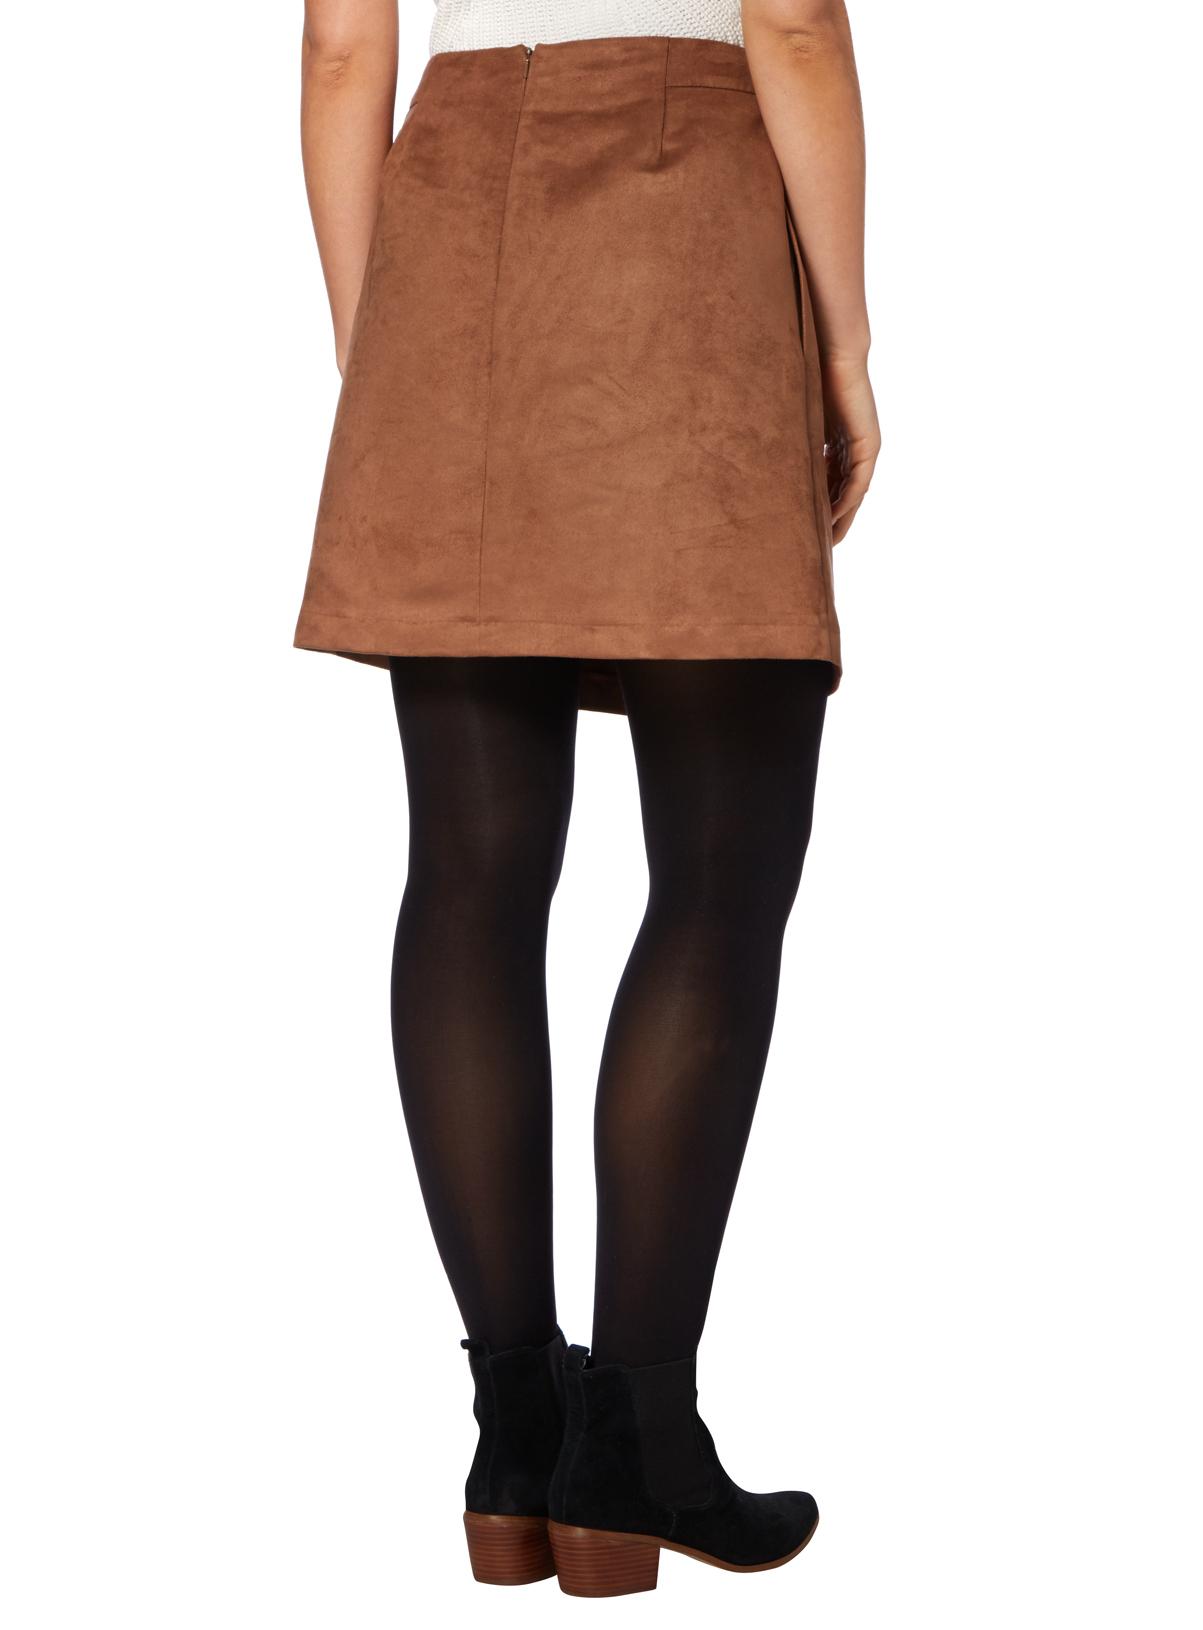 Womens Camel Suede Skirt | Tu clothing